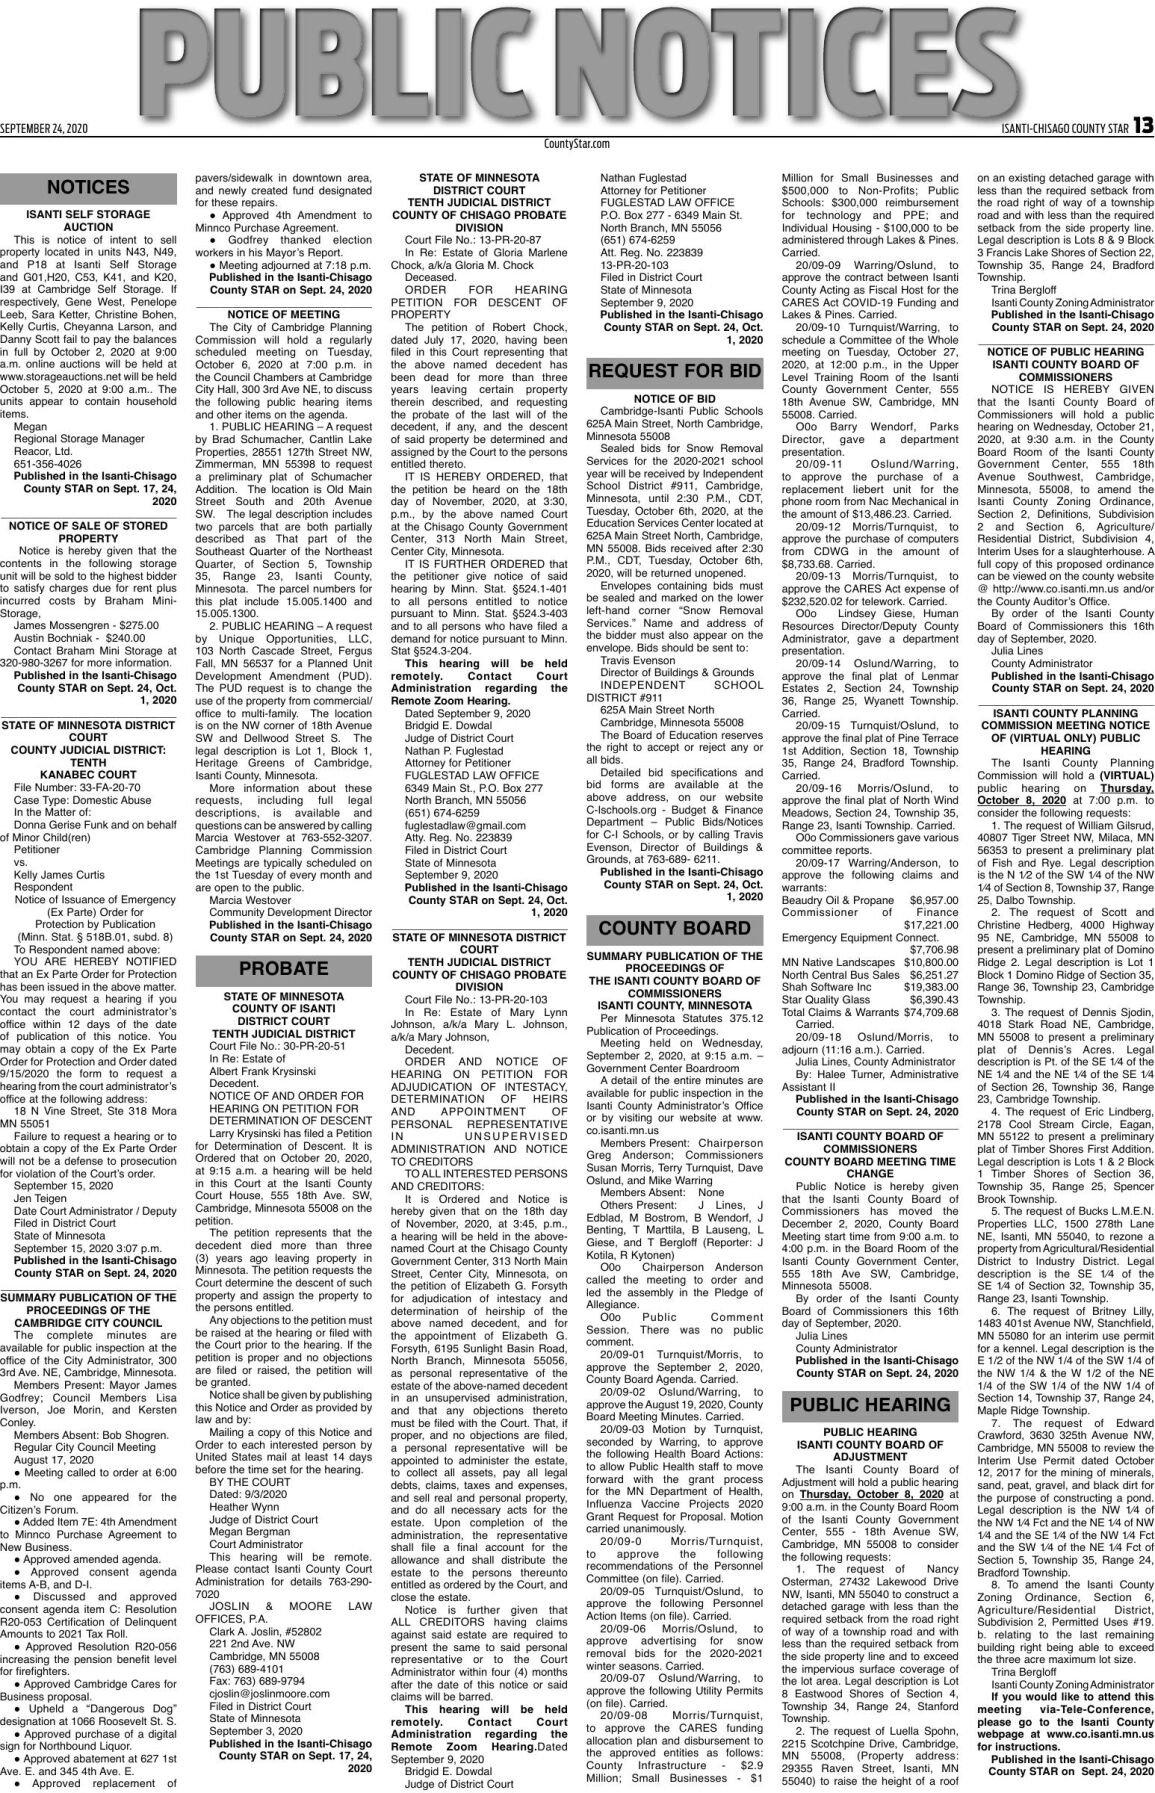 Public Notices - September 24, 2020